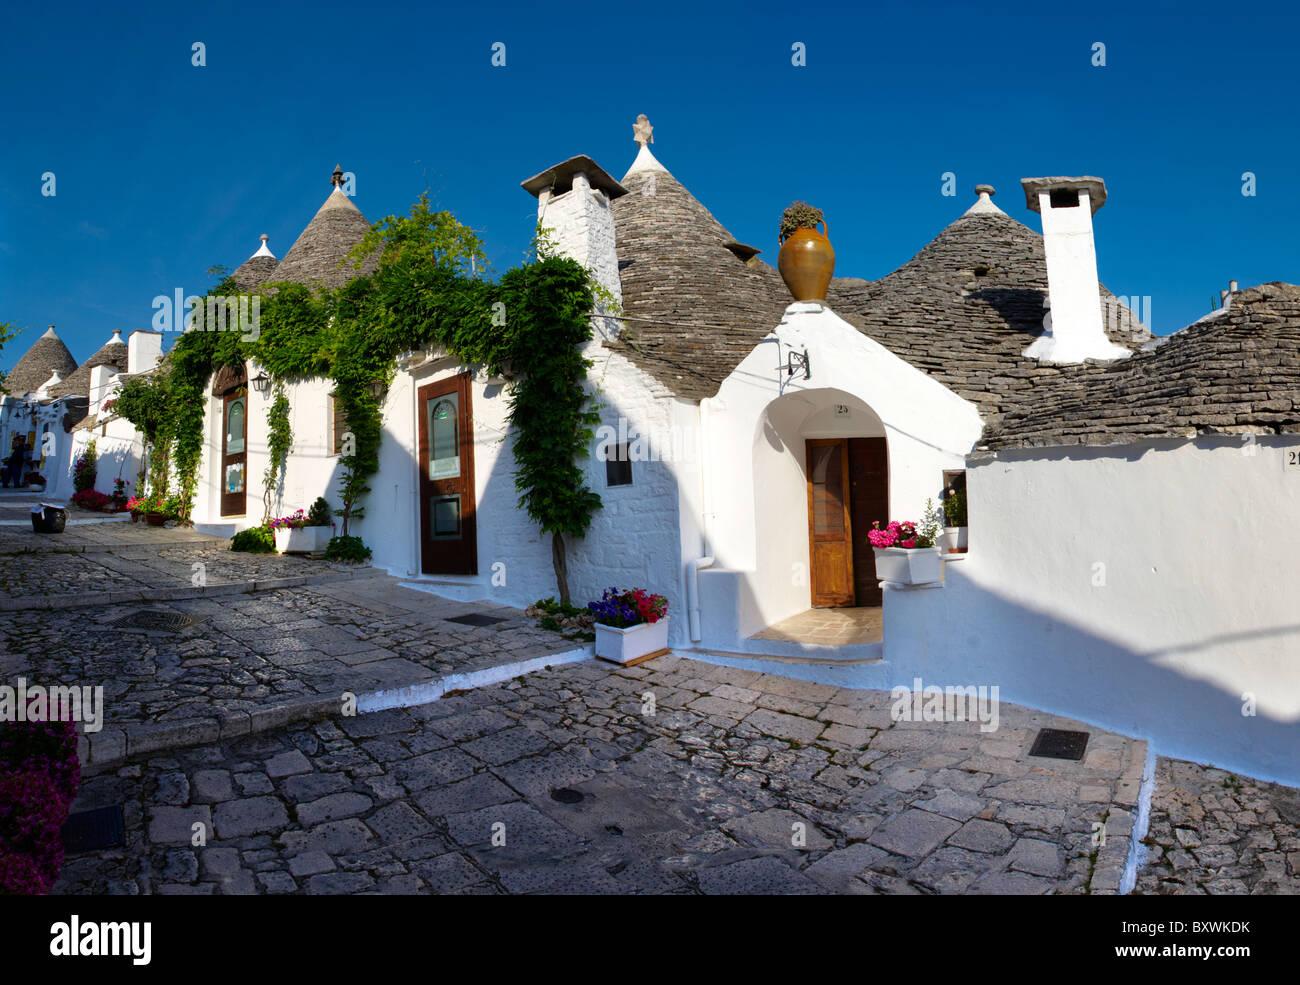 Casas trulli de Alberobello, Puglia, Italia. Imagen De Stock